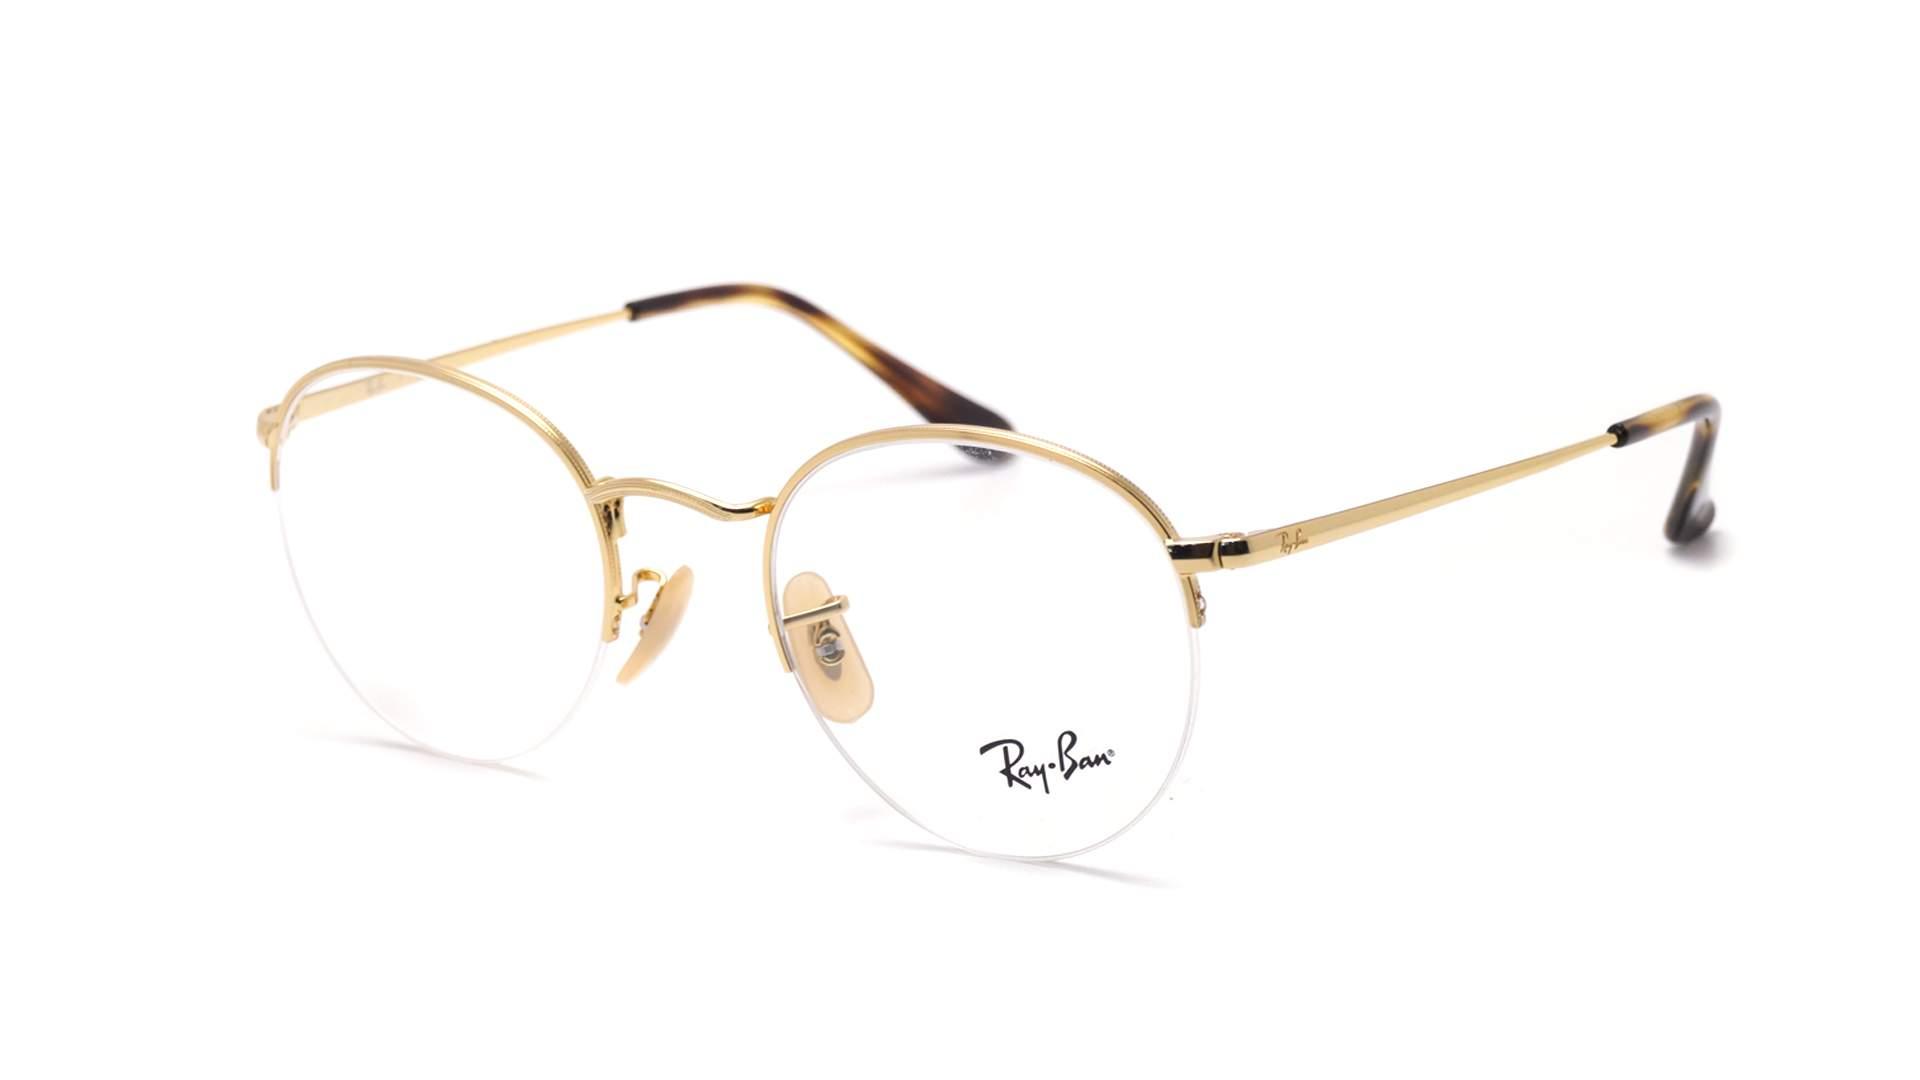 8bb85fcdac2 Eyeglasses Ray-Ban Gaze Gold RX3947 RB3947V 2500 48-22 Small